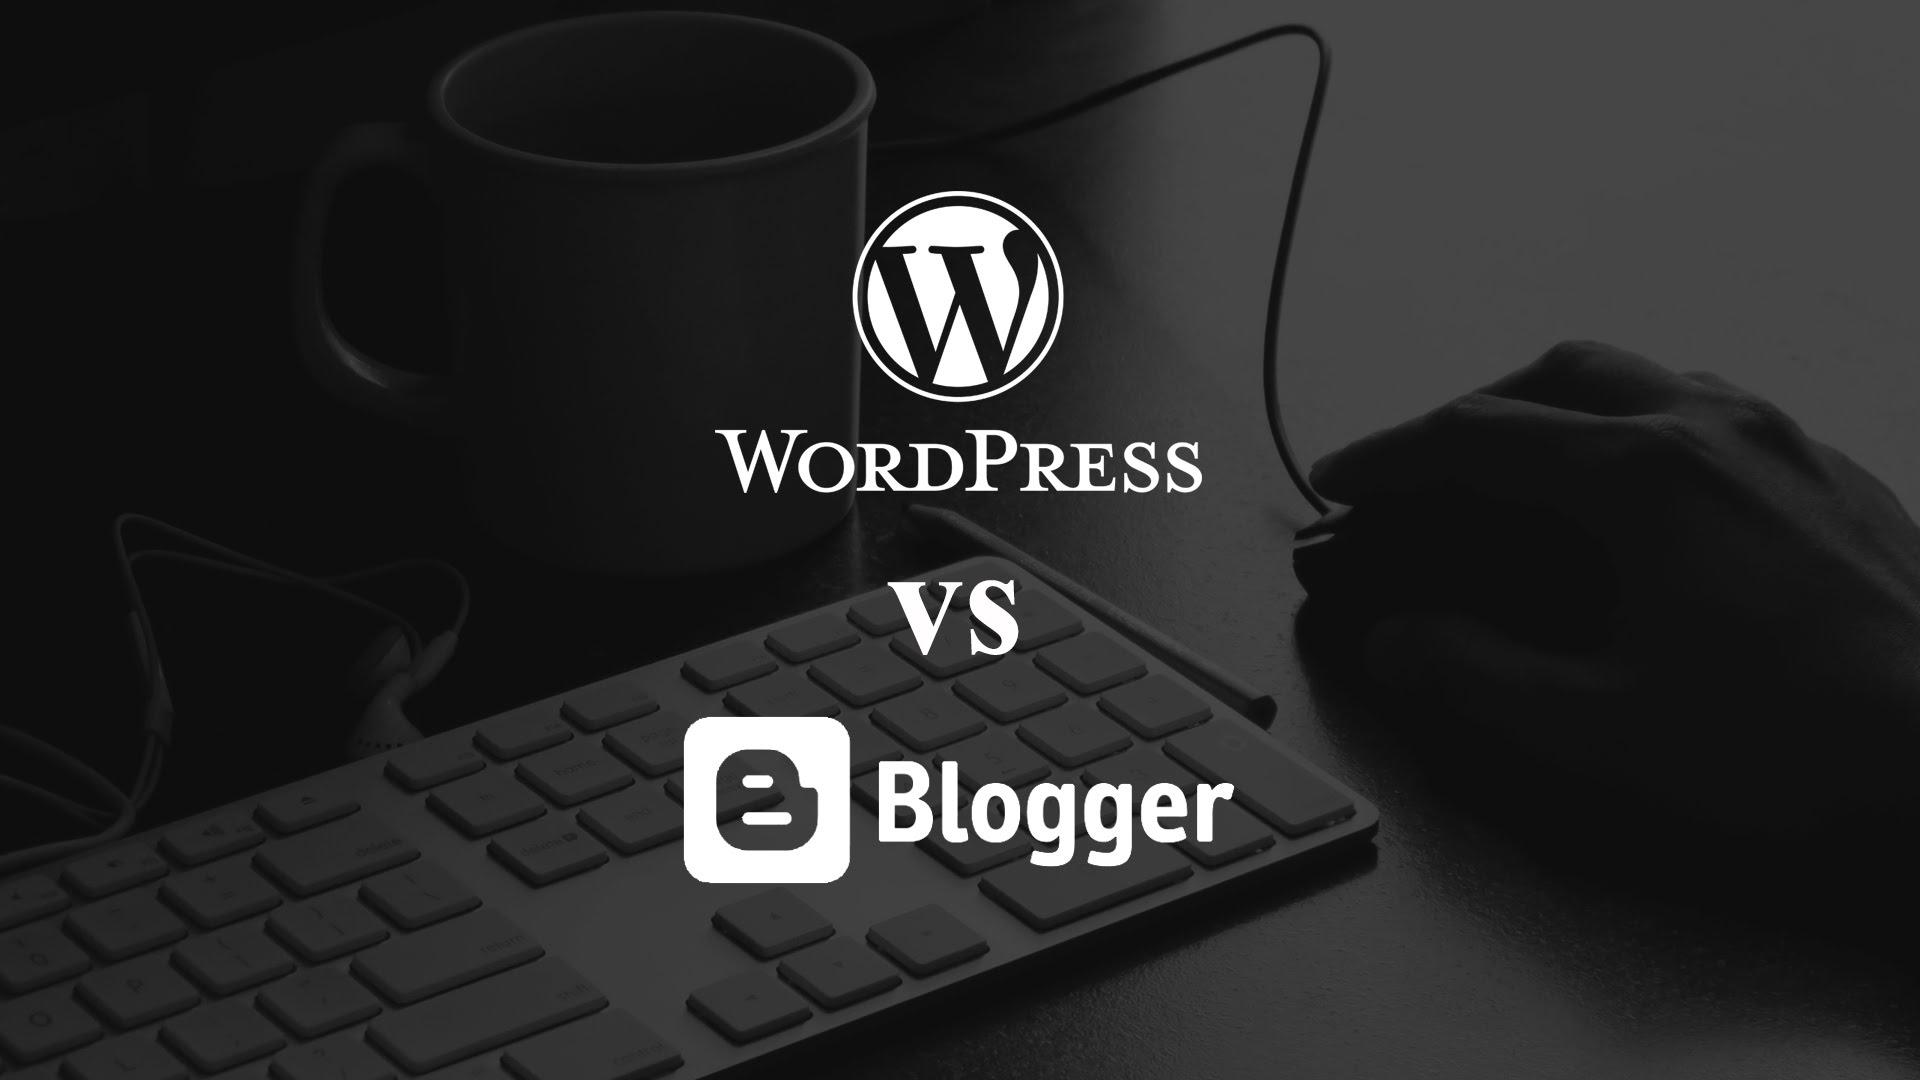 Choosing between WordPress and Blogger